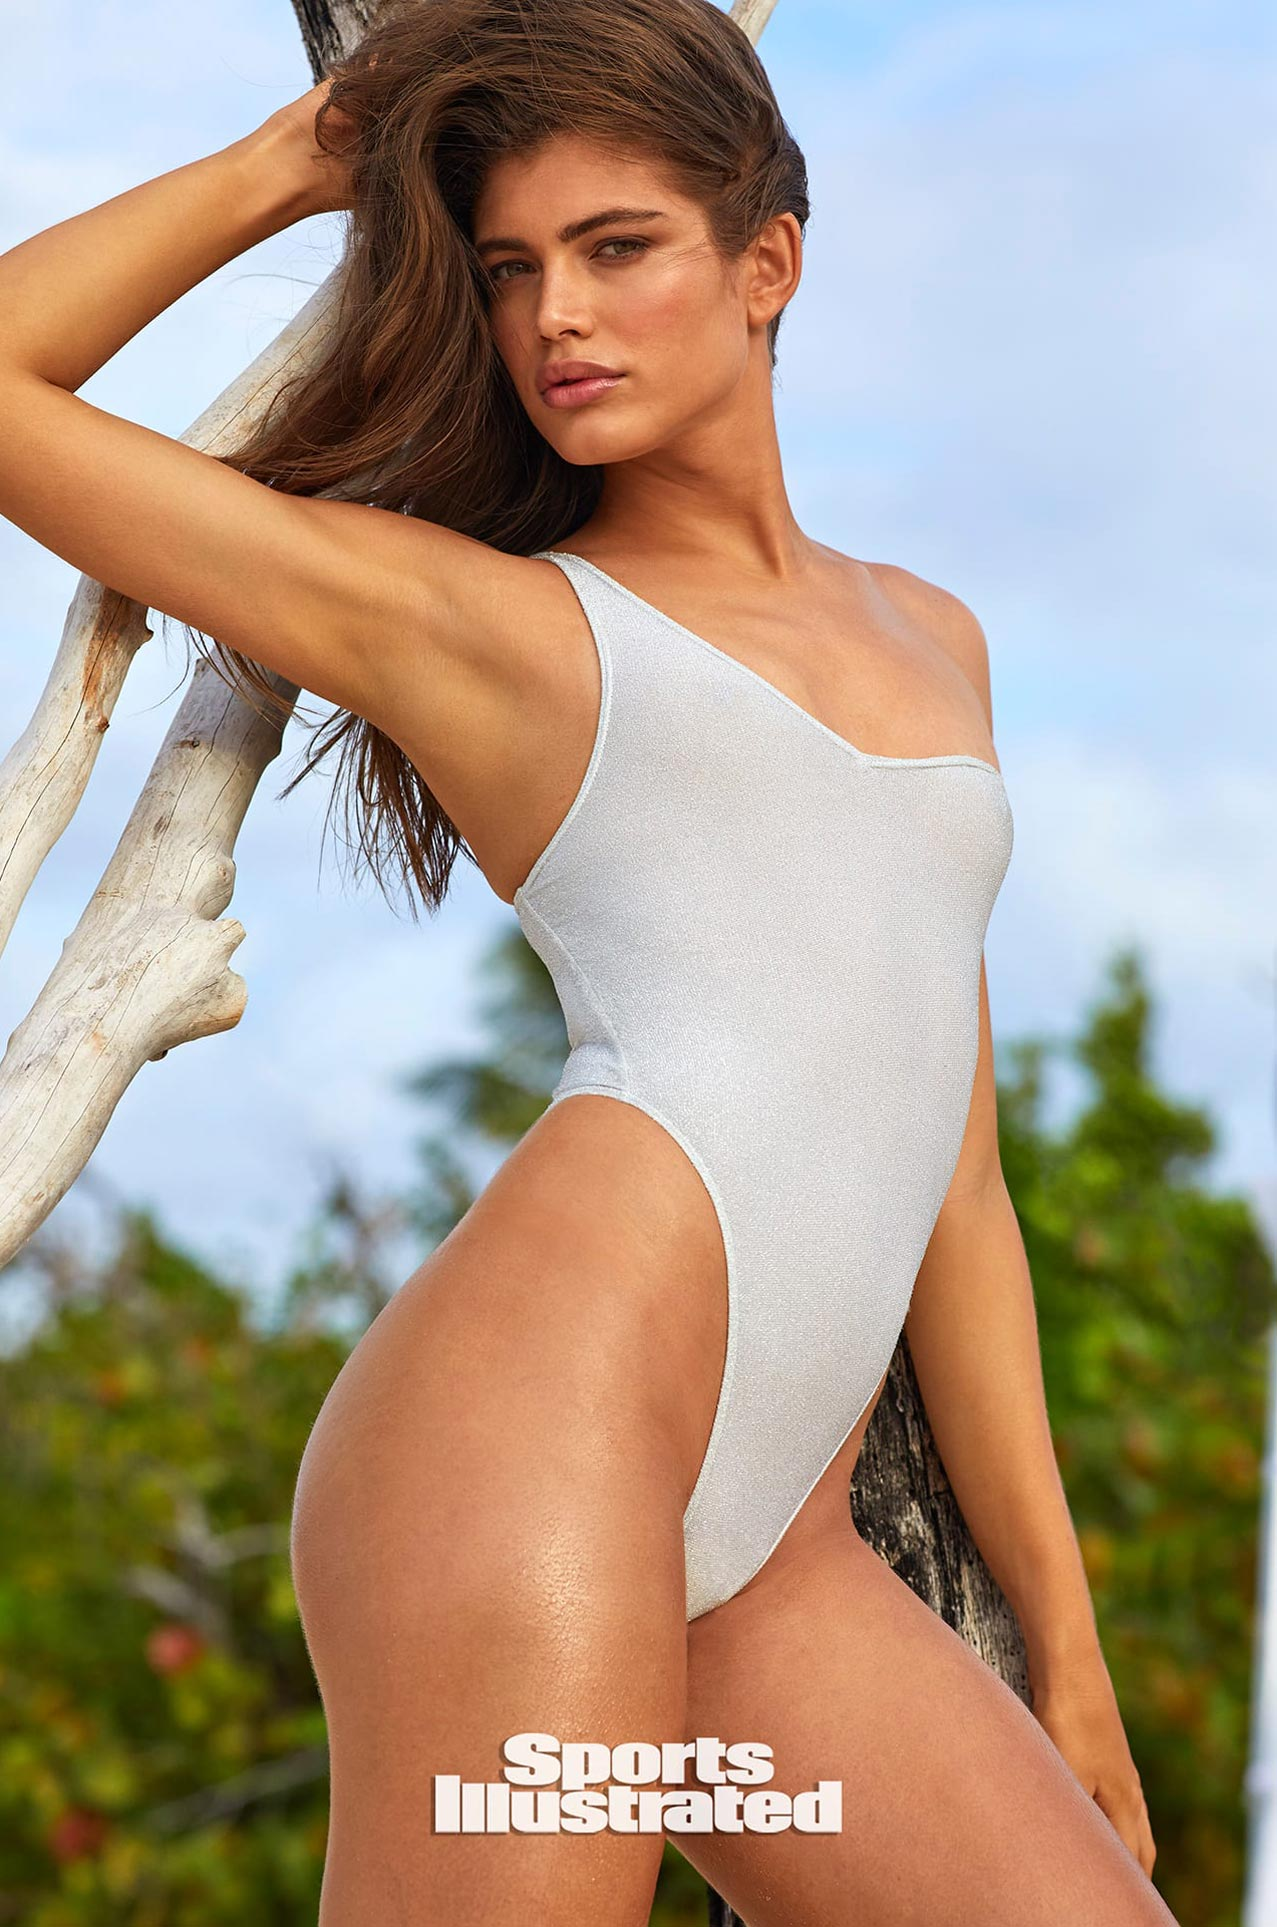 Валентина Сампайо в каталоге купальников Sports Illustrated Swimsuit 2020 / фото 19